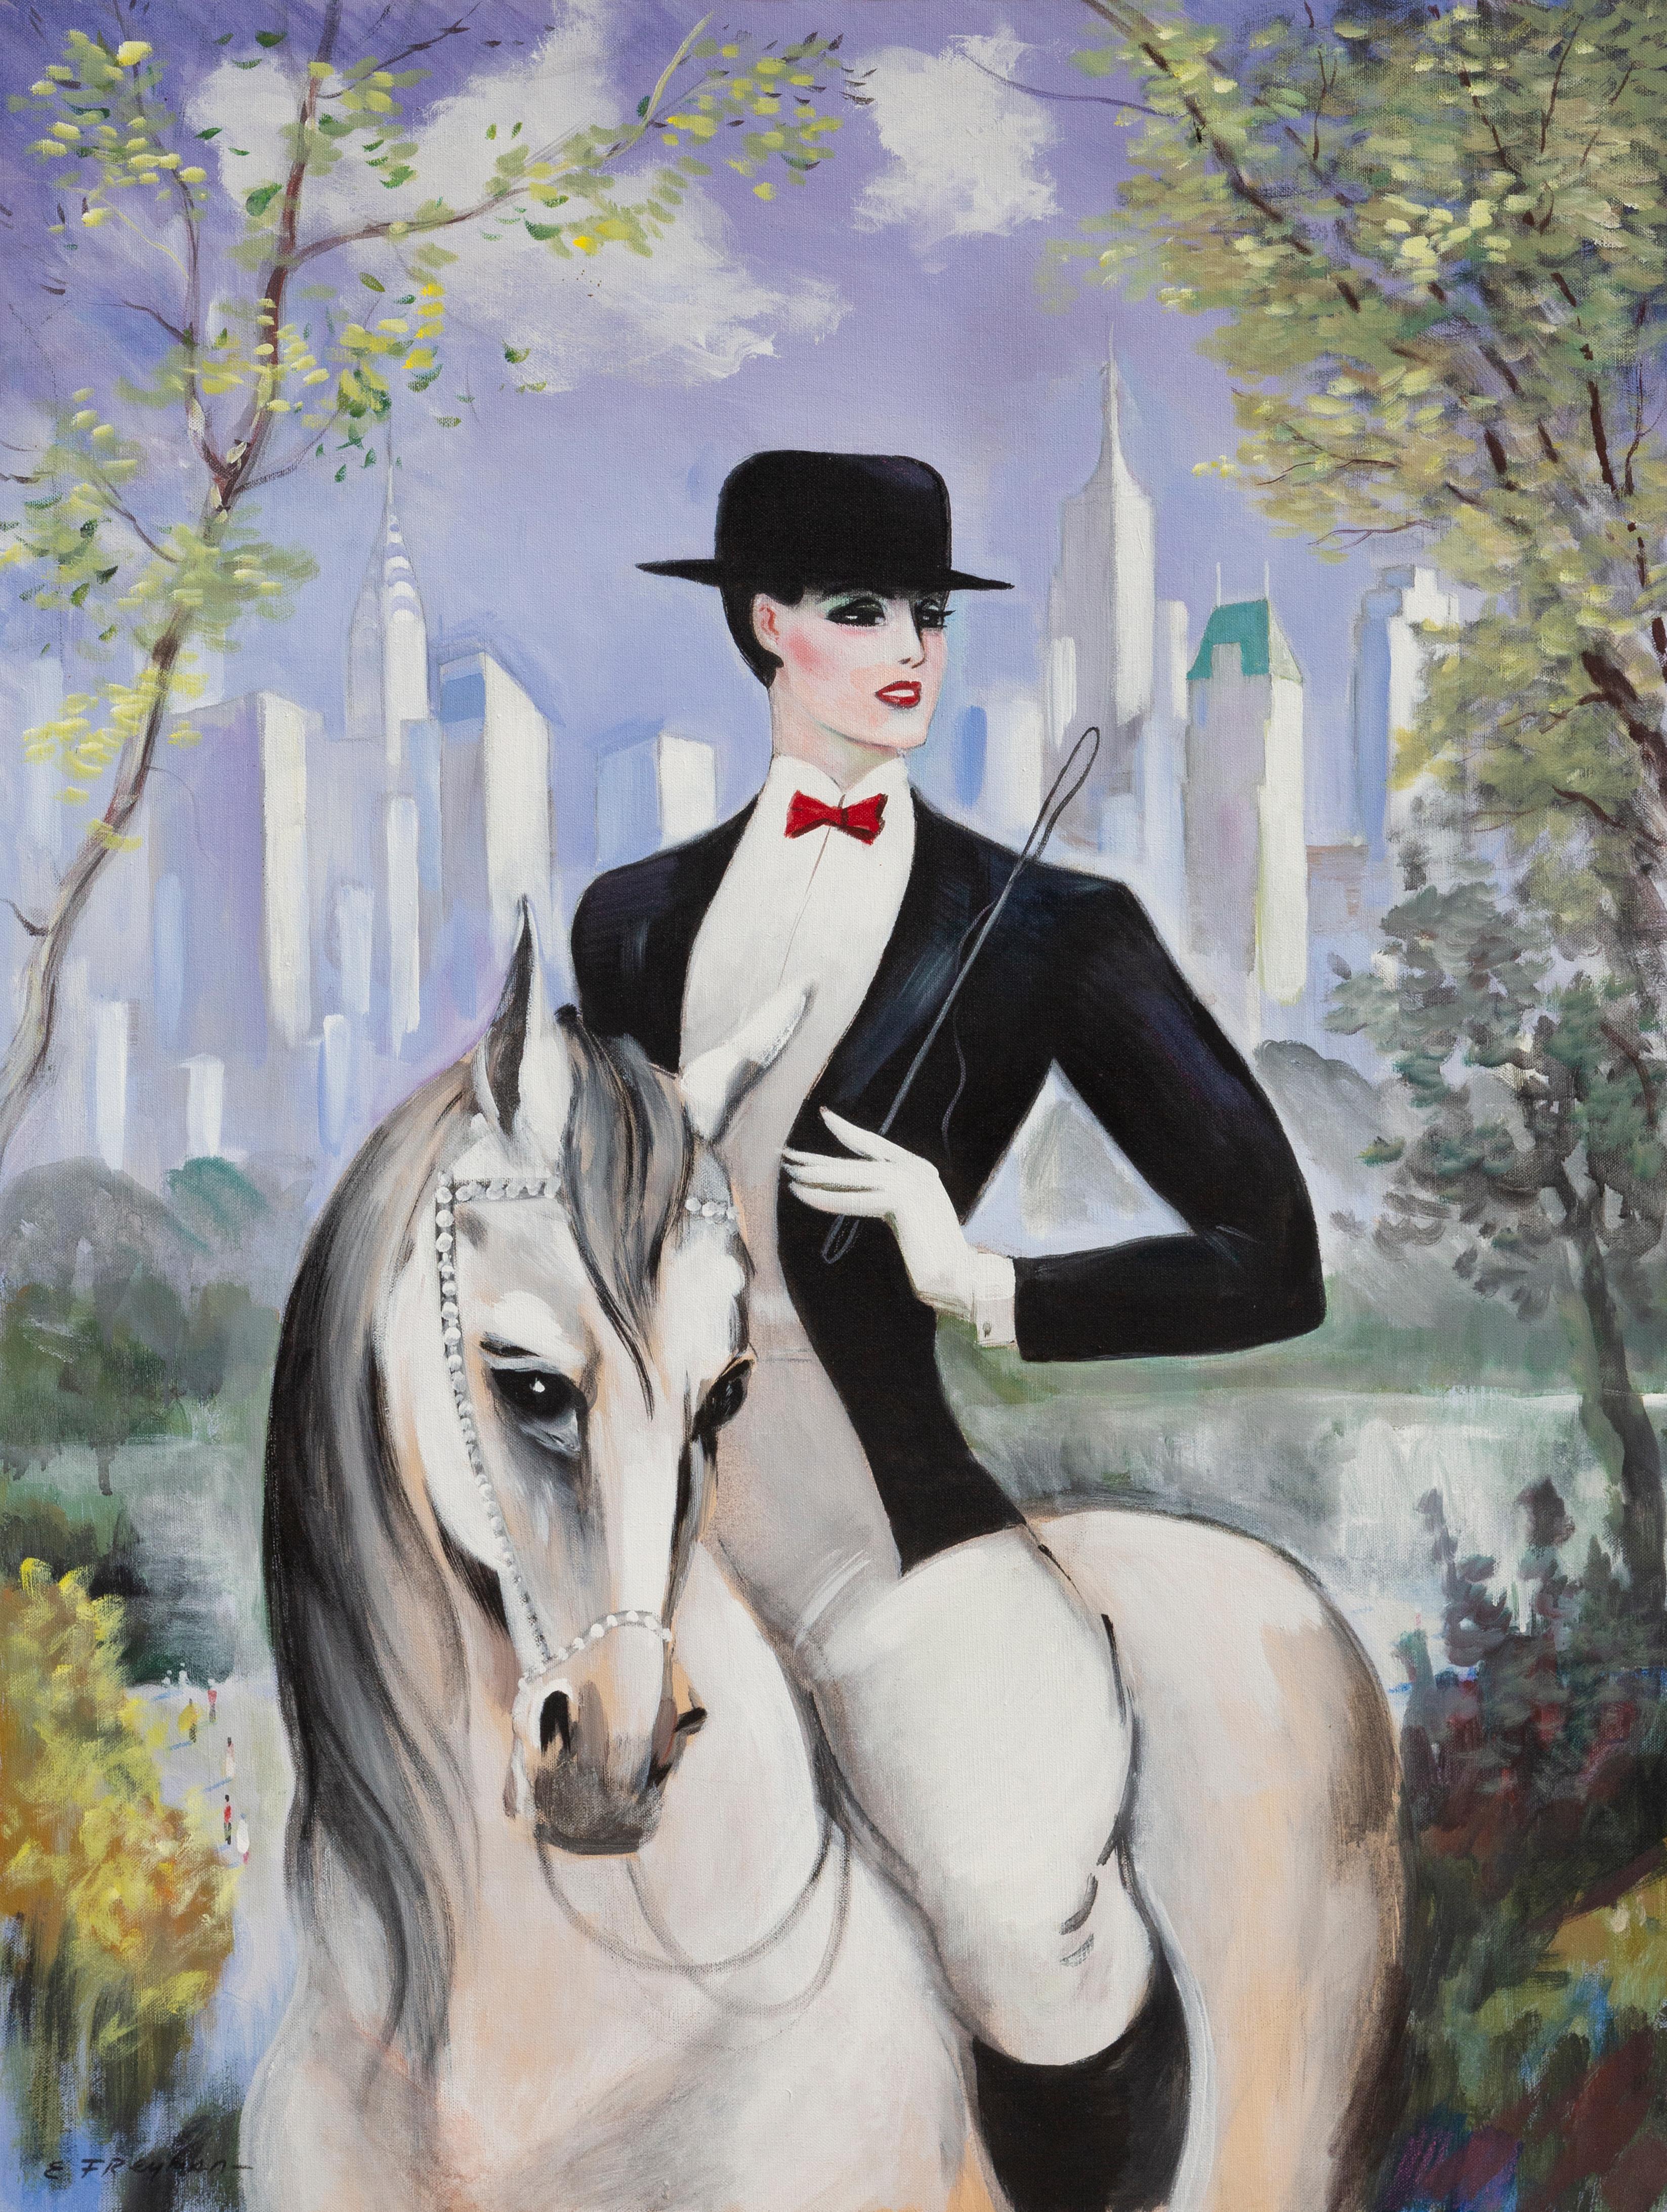 Equestrienne, Large Art Deco Painting by Erik Freyman